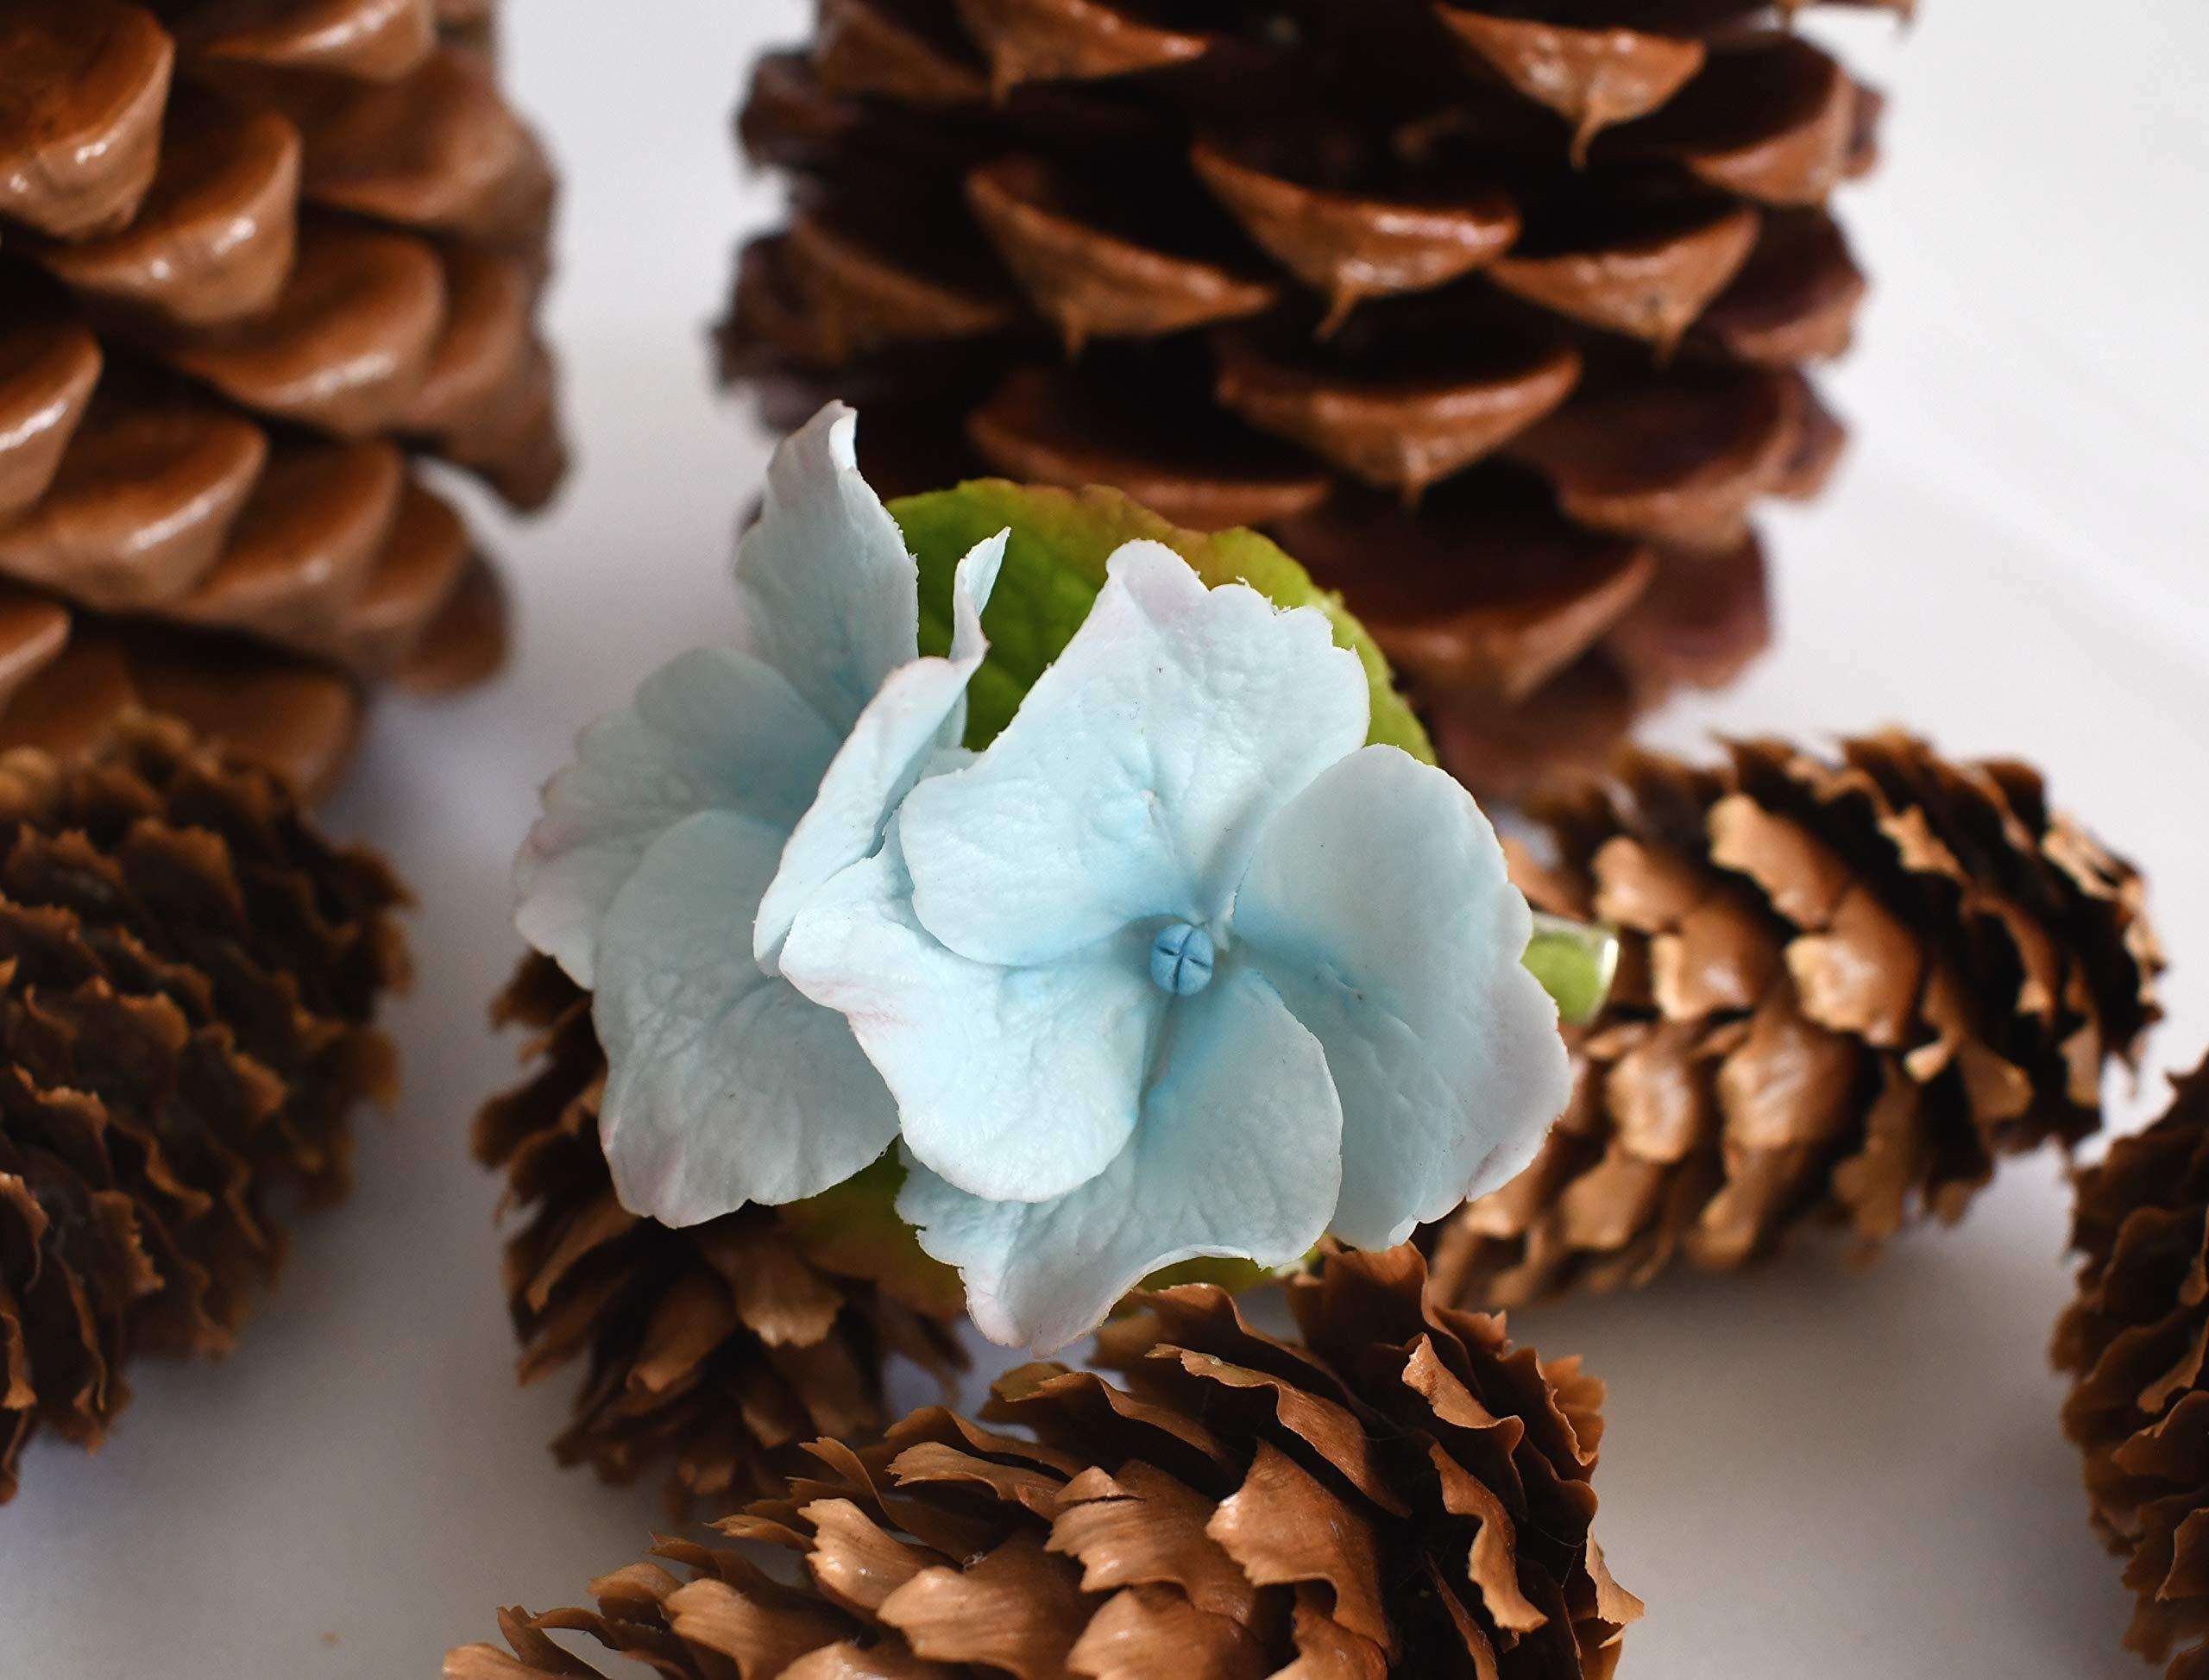 Handmade Hydrangea Hair Pin | Air Dry Clay |Size 5 cm X 6 cm | 0.2 oz by 4T_ClayFlowers